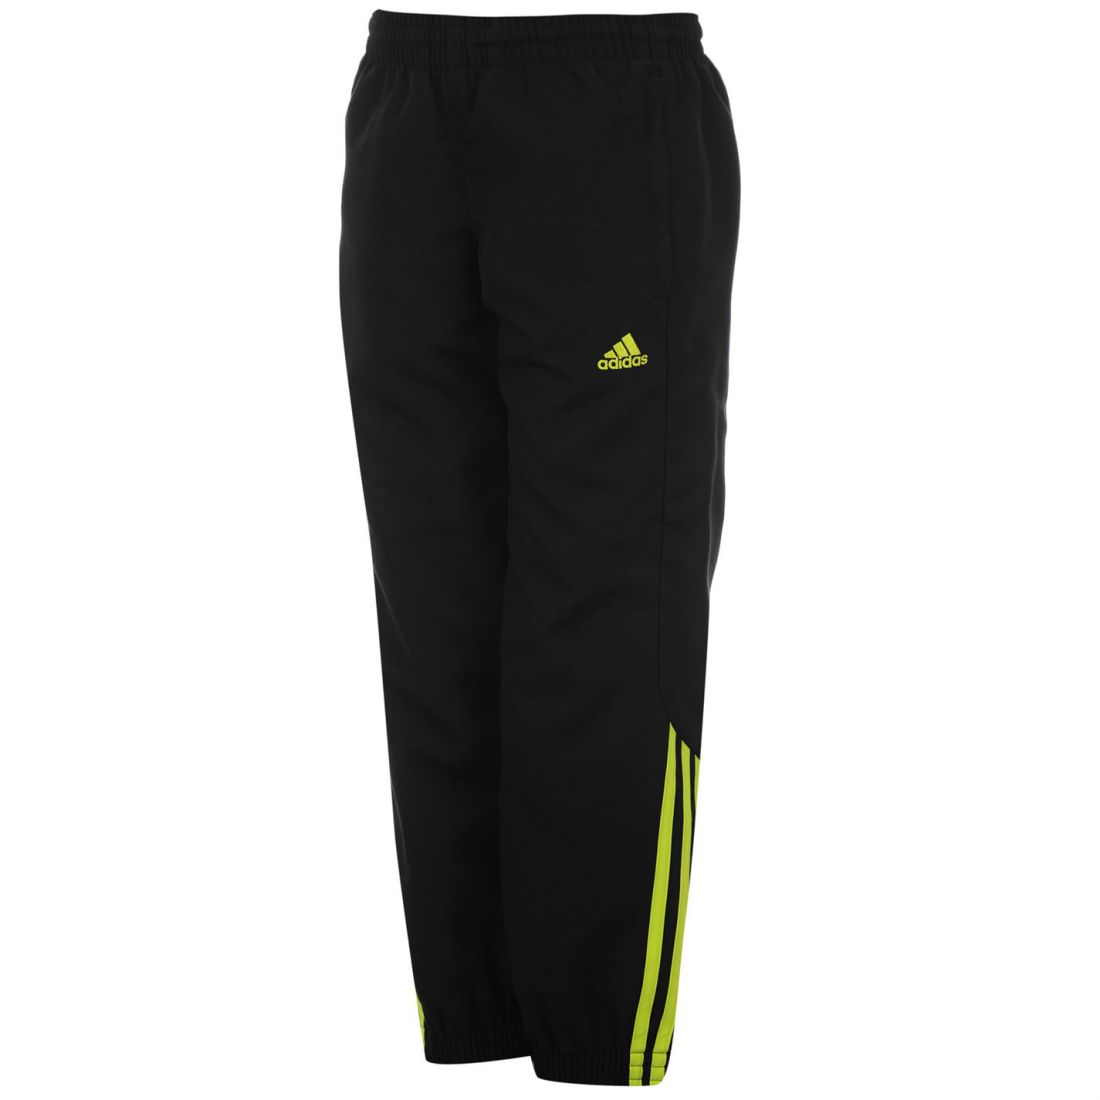 44e5aa1e9160 adidas Samson 2 Sweat Pants Junior Mesh Lining Casual Boys Children 6 6 di  10 ...